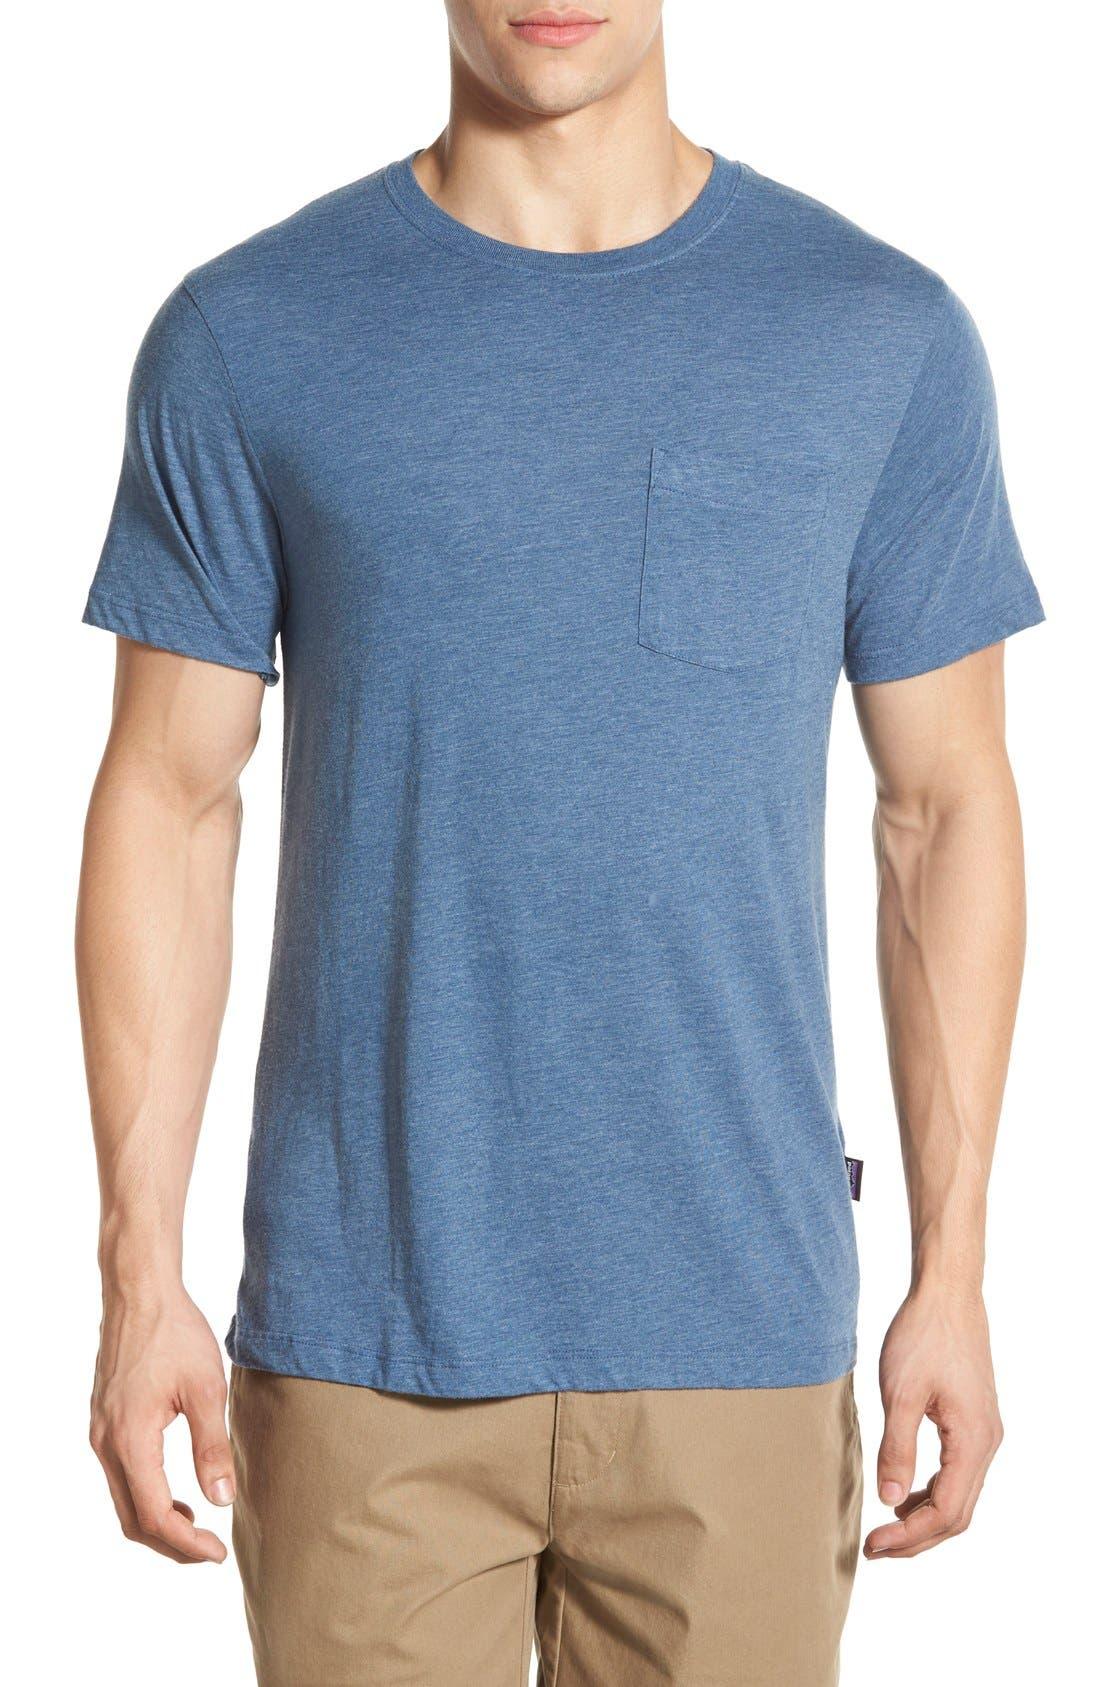 Main Image - Patagonia 'Daily Triblend' Pocket T-Shirt